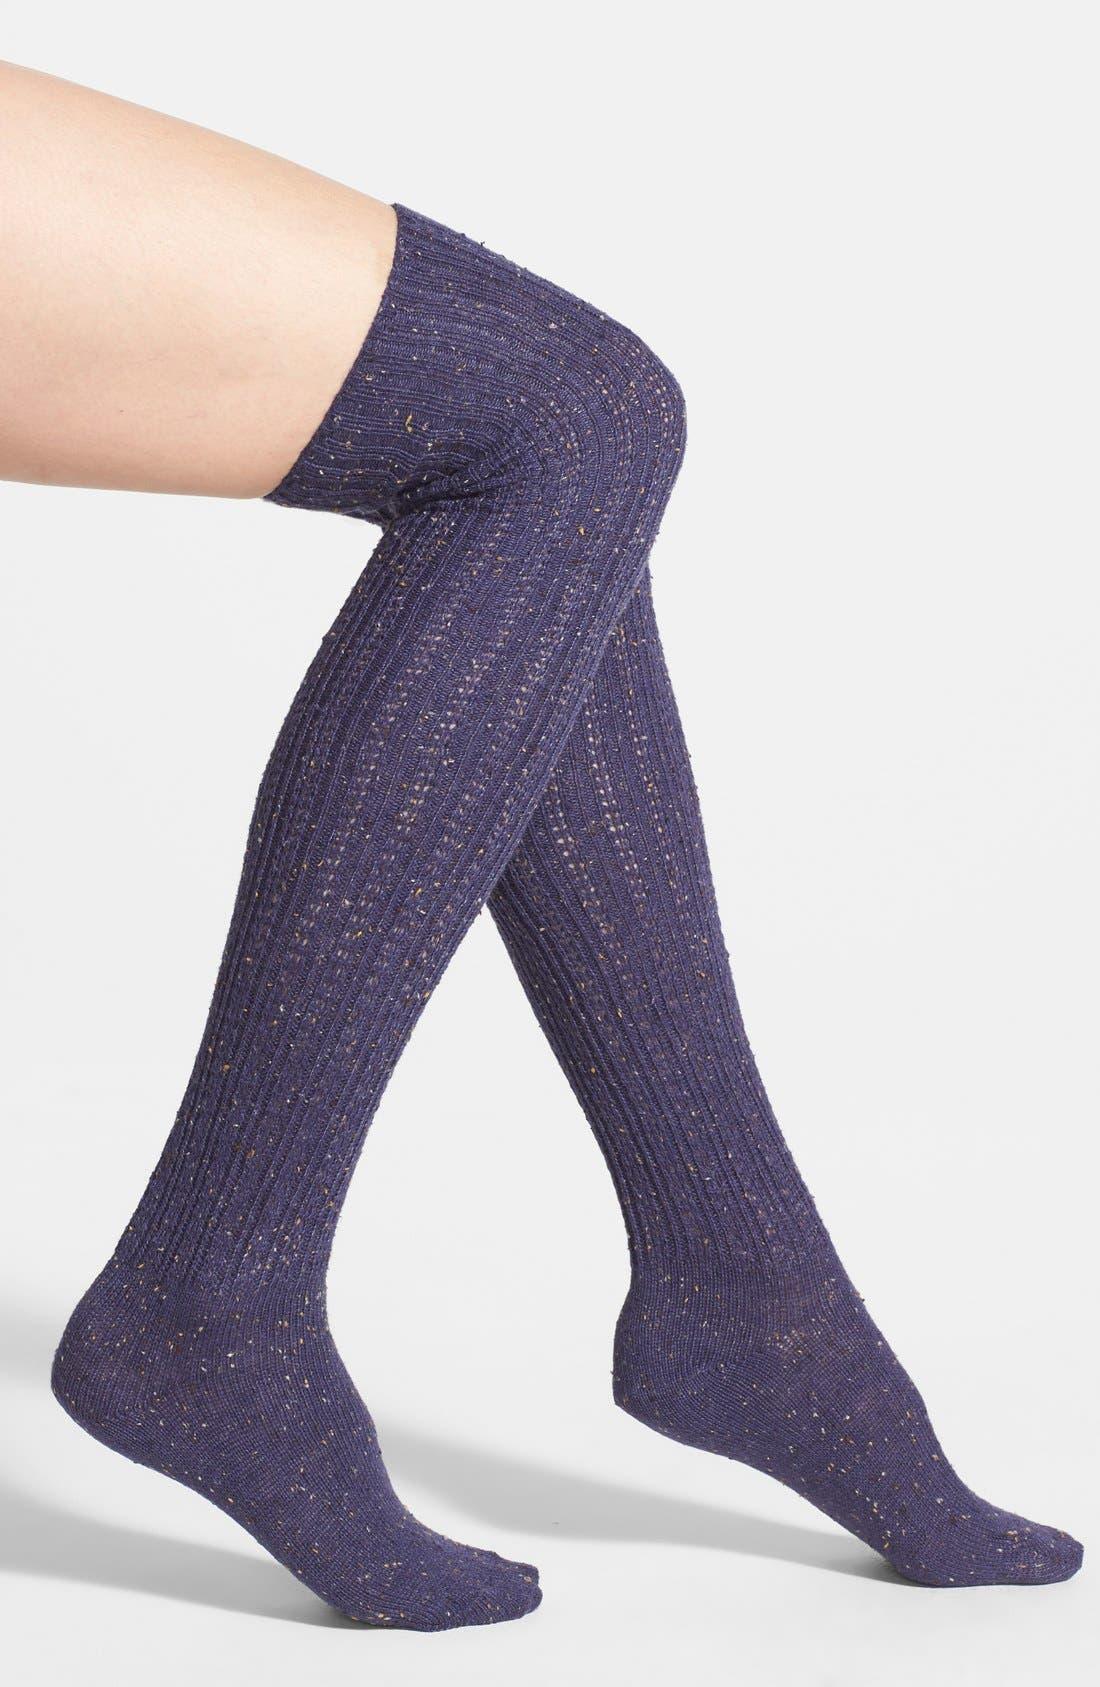 Alternate Image 1 Selected - Free People Speckled Over the Knee Socks